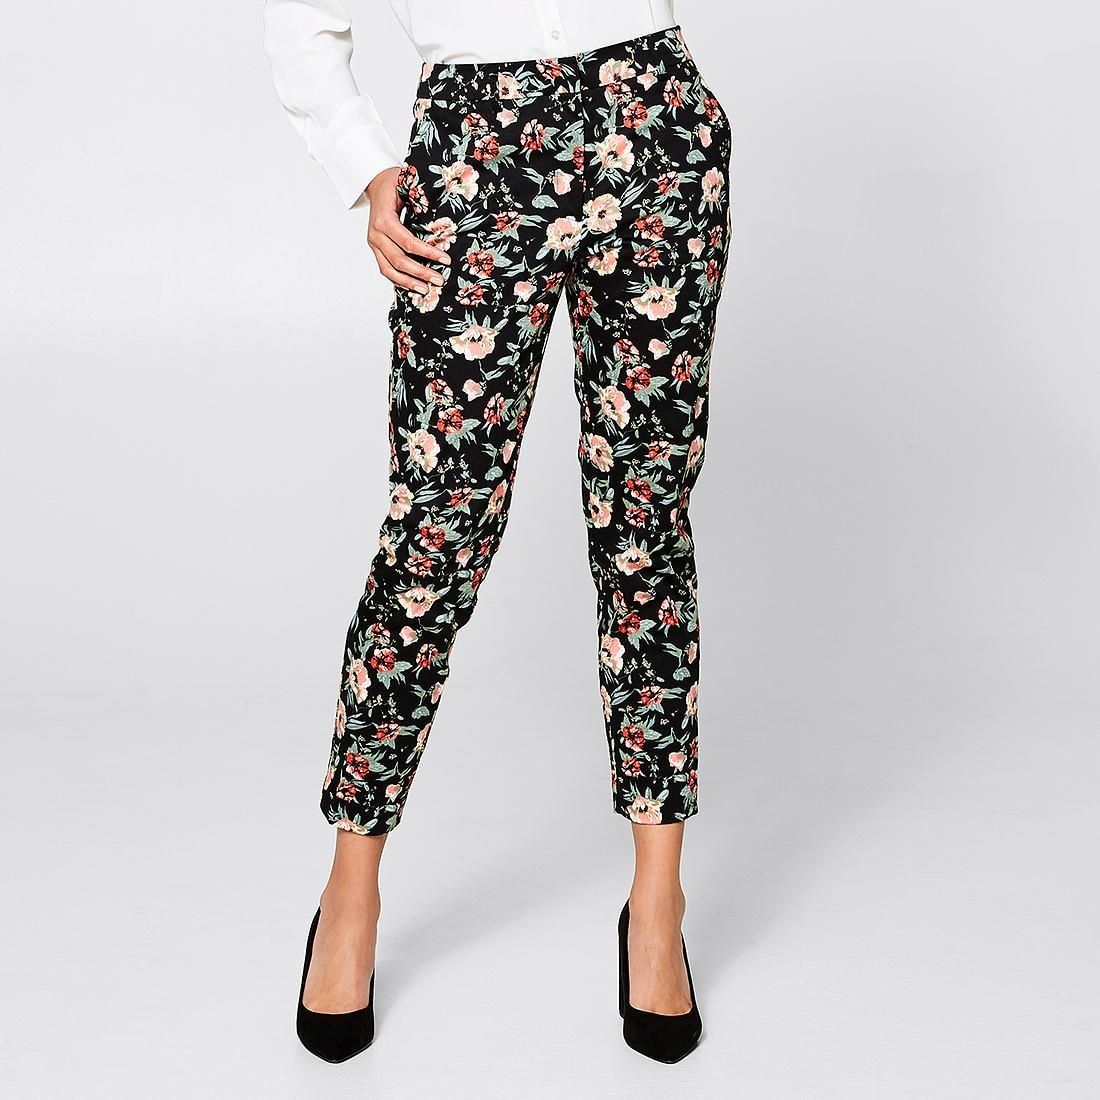 Slim 7/8 Sateen Pants Floral Print Pants, Holiday